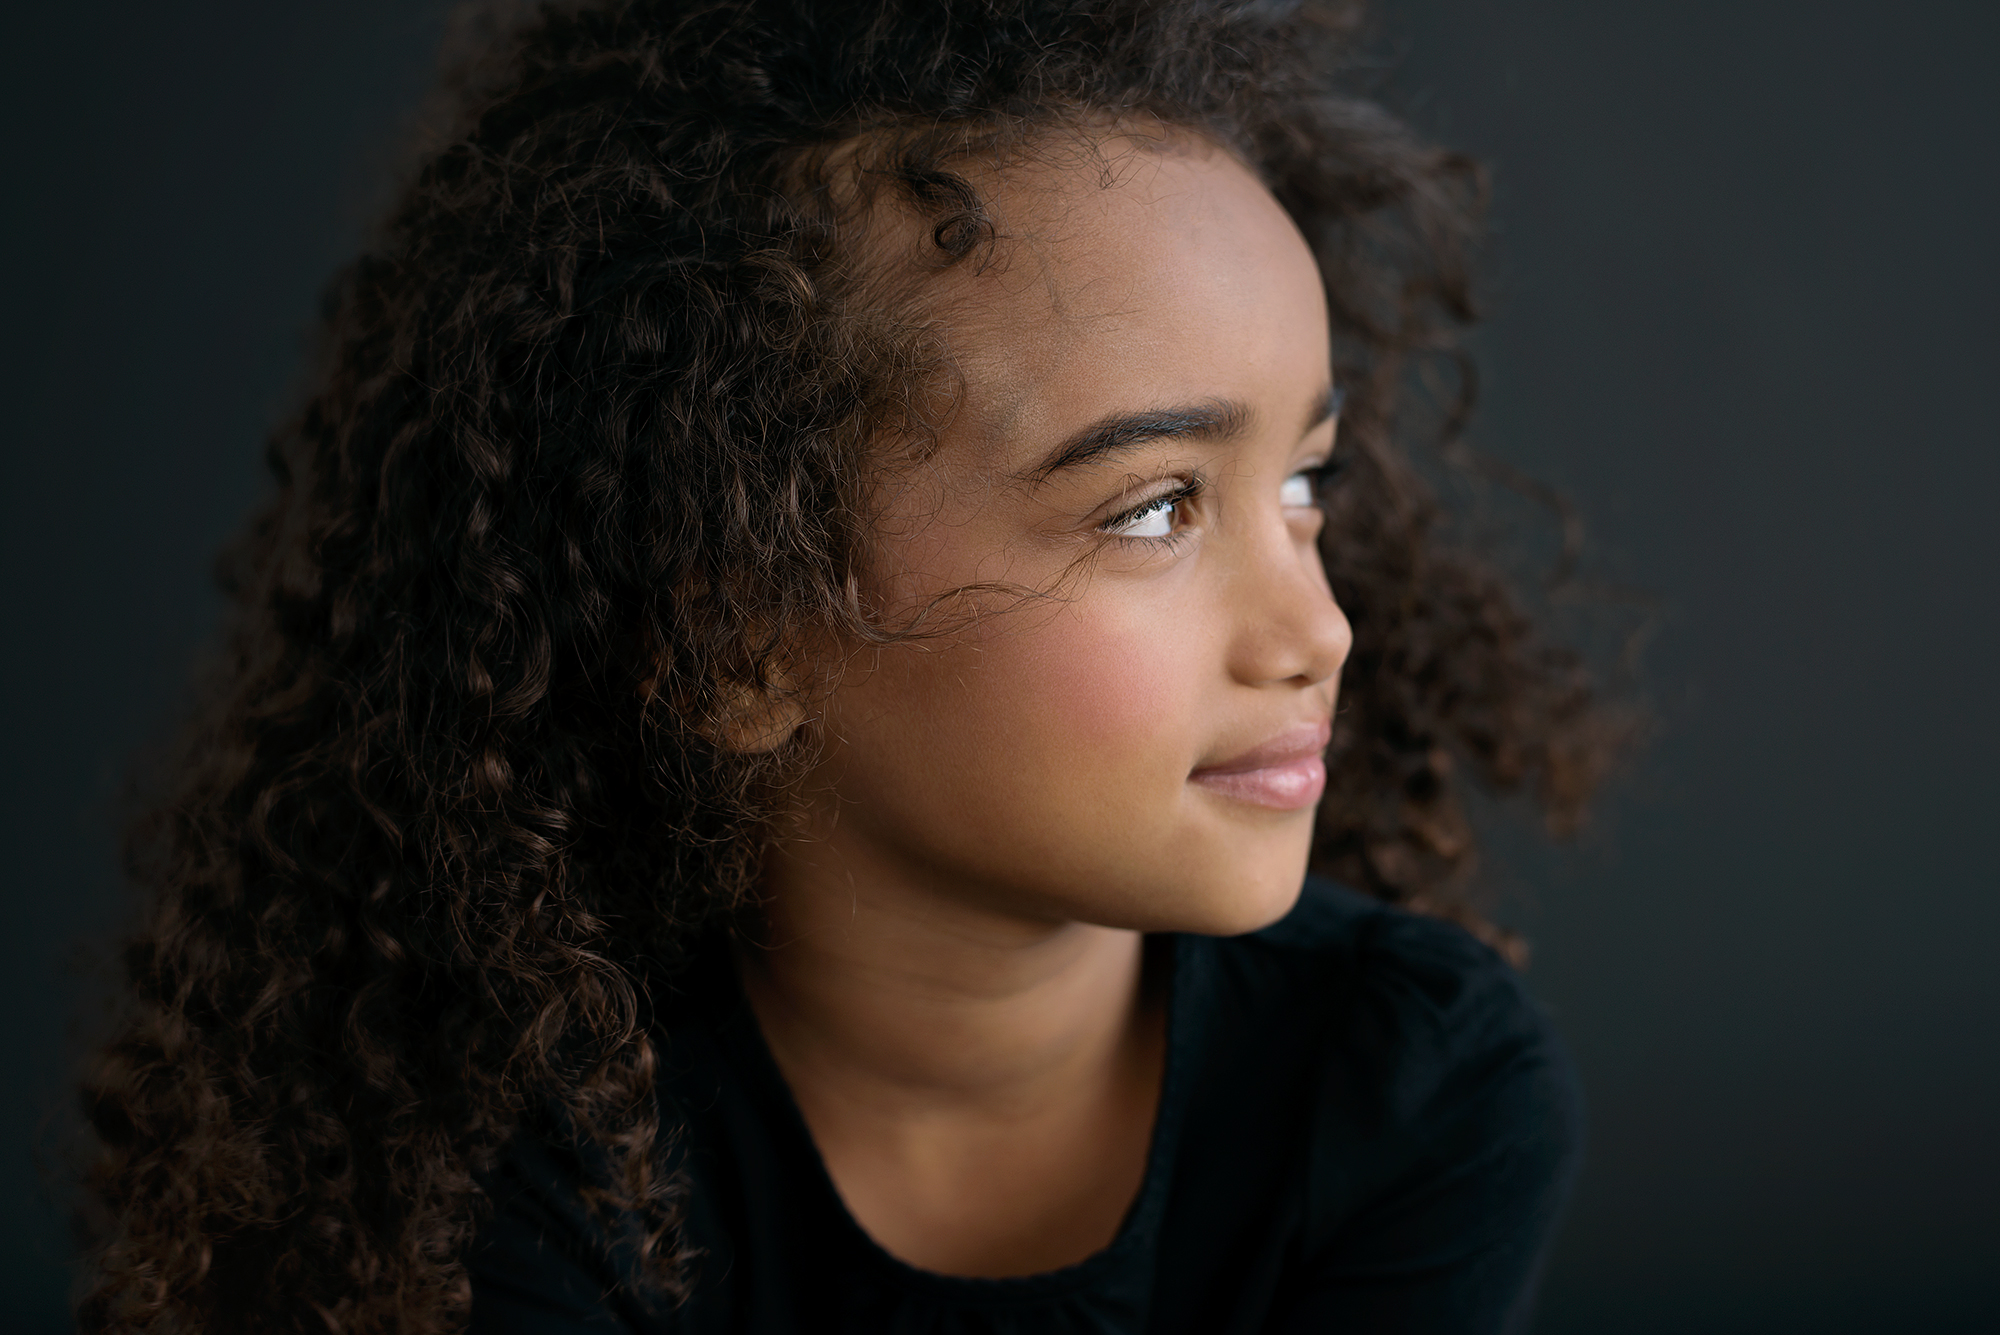 Vivienne © 2014 Modern Kids Co. | @modernkids